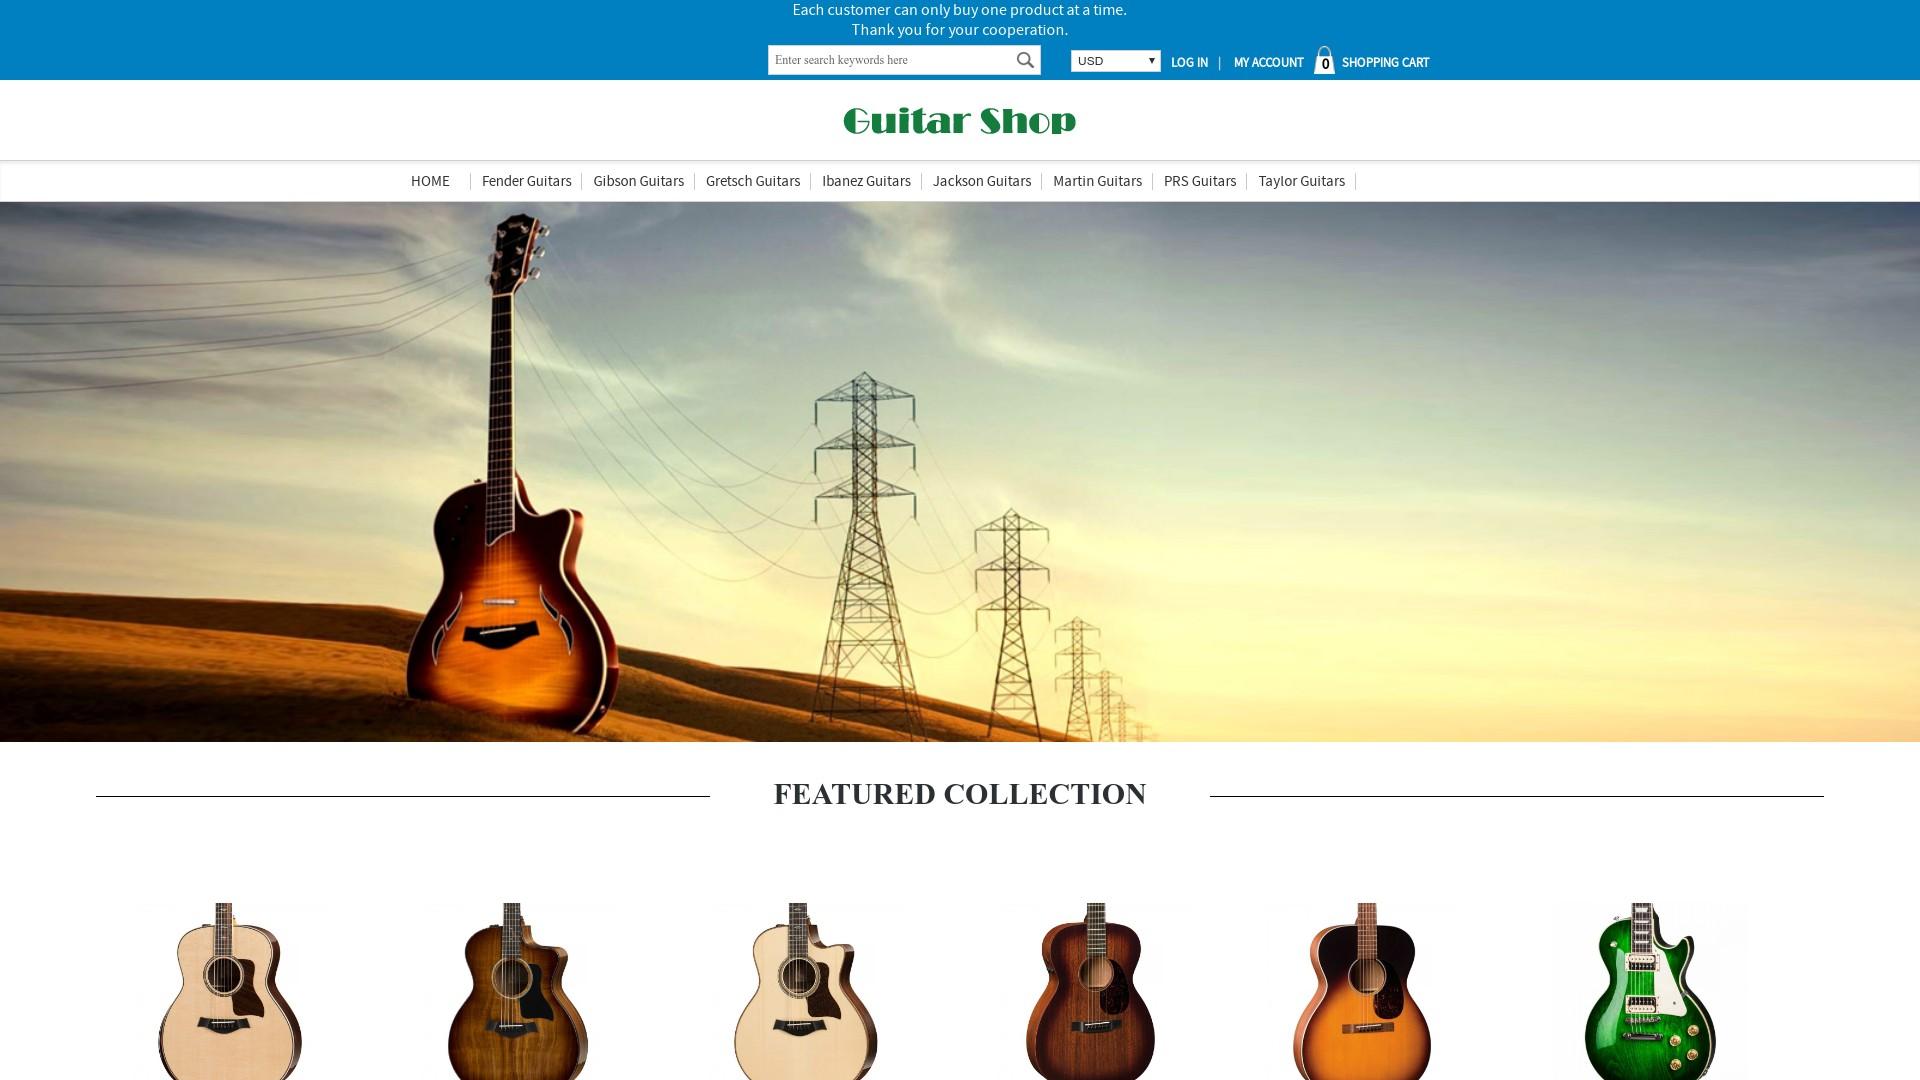 Deathones Guitar Shop Scam? Review of the Store